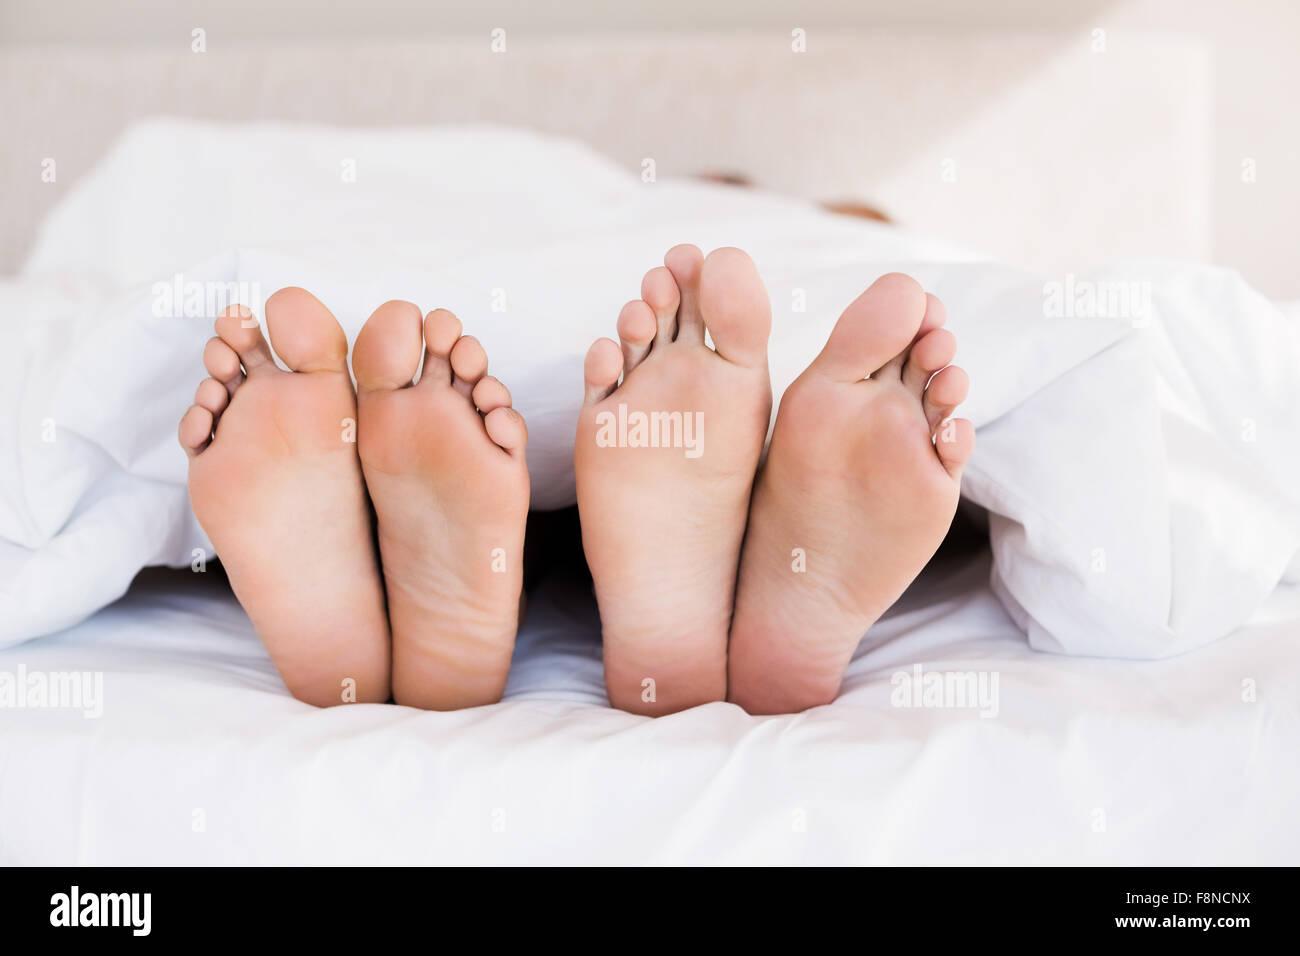 Candid feet soles solas pezinhos nathane039s feet 05